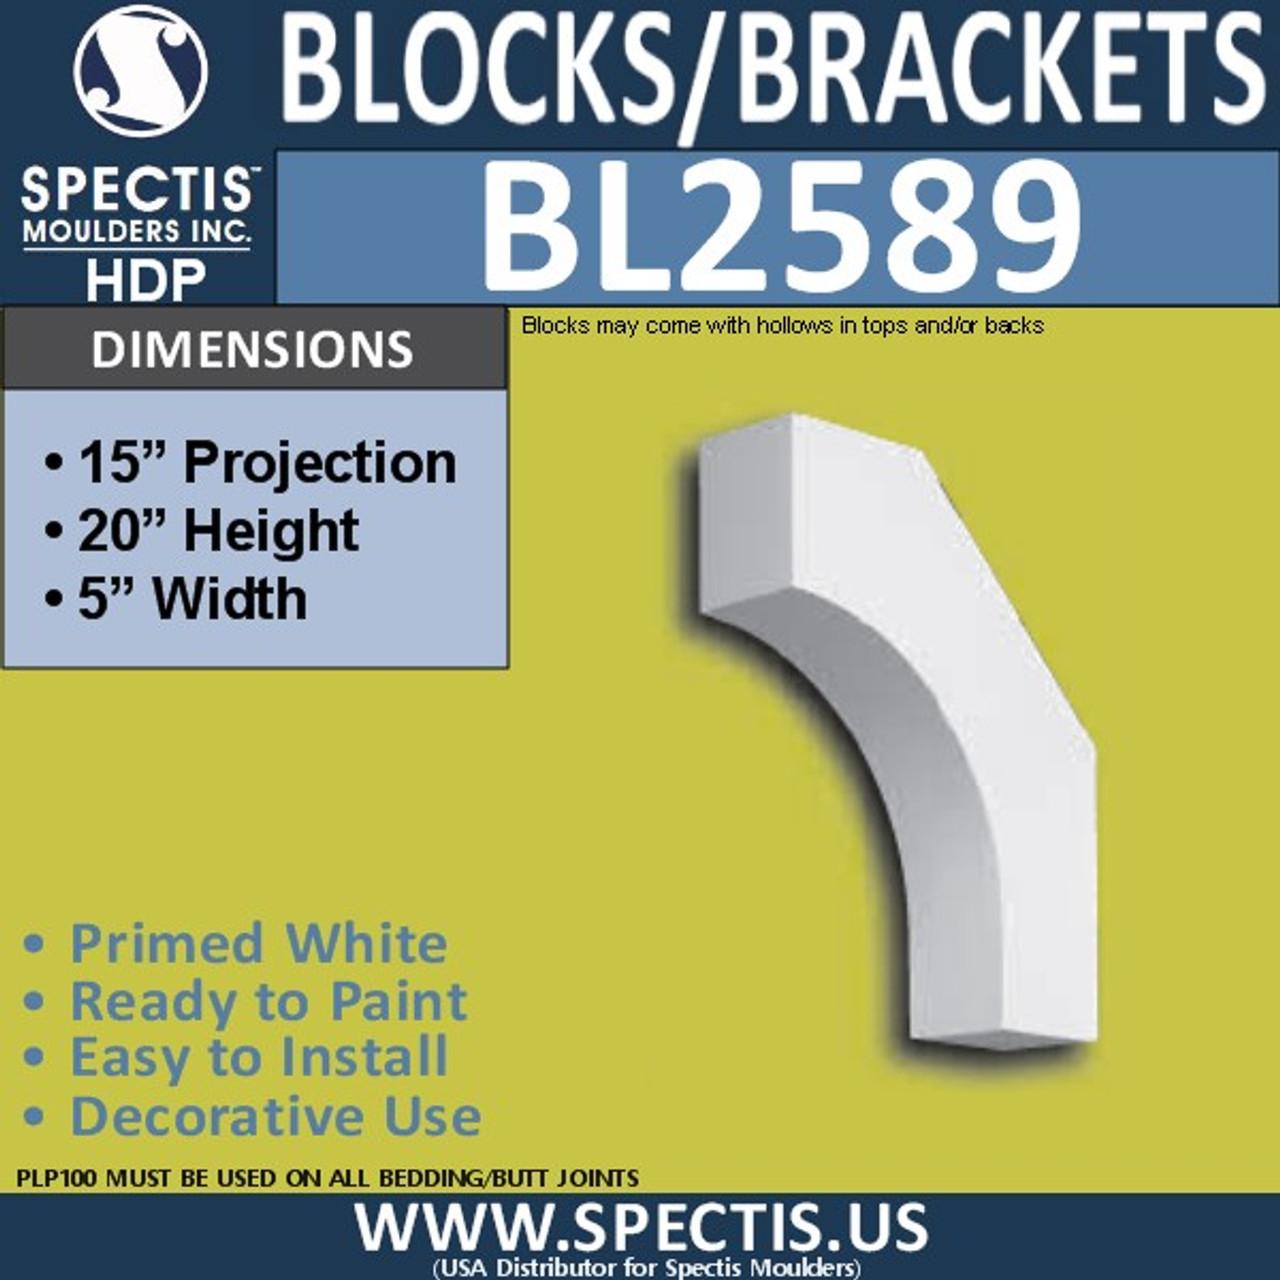 "BL2589 Eave Block or Bracket 5""W x 20""H x 15"" P"